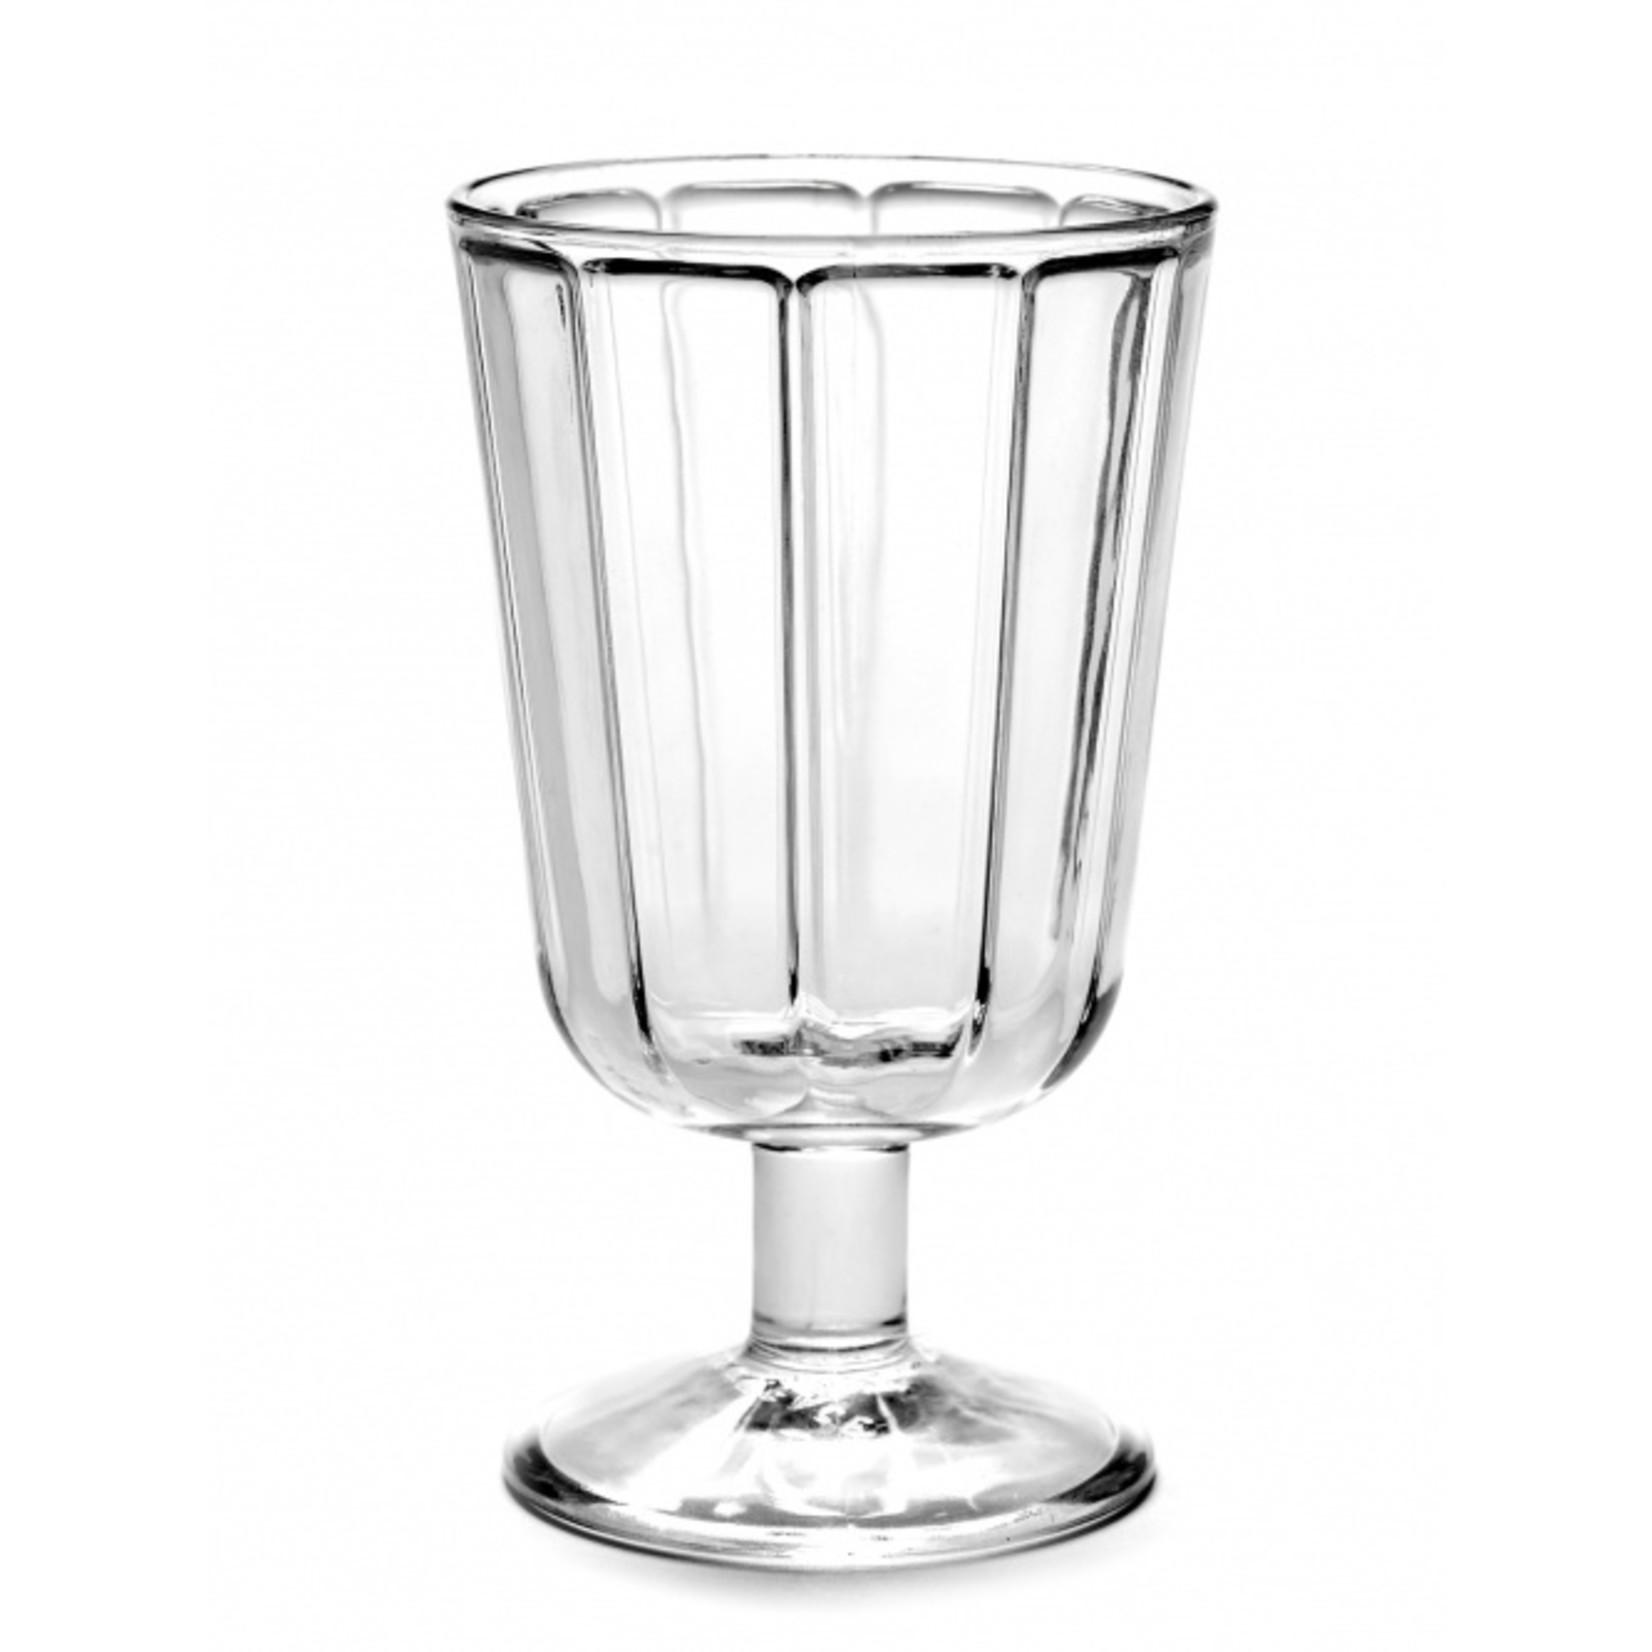 Sergio Herman Surface Rode wijn glas Surface